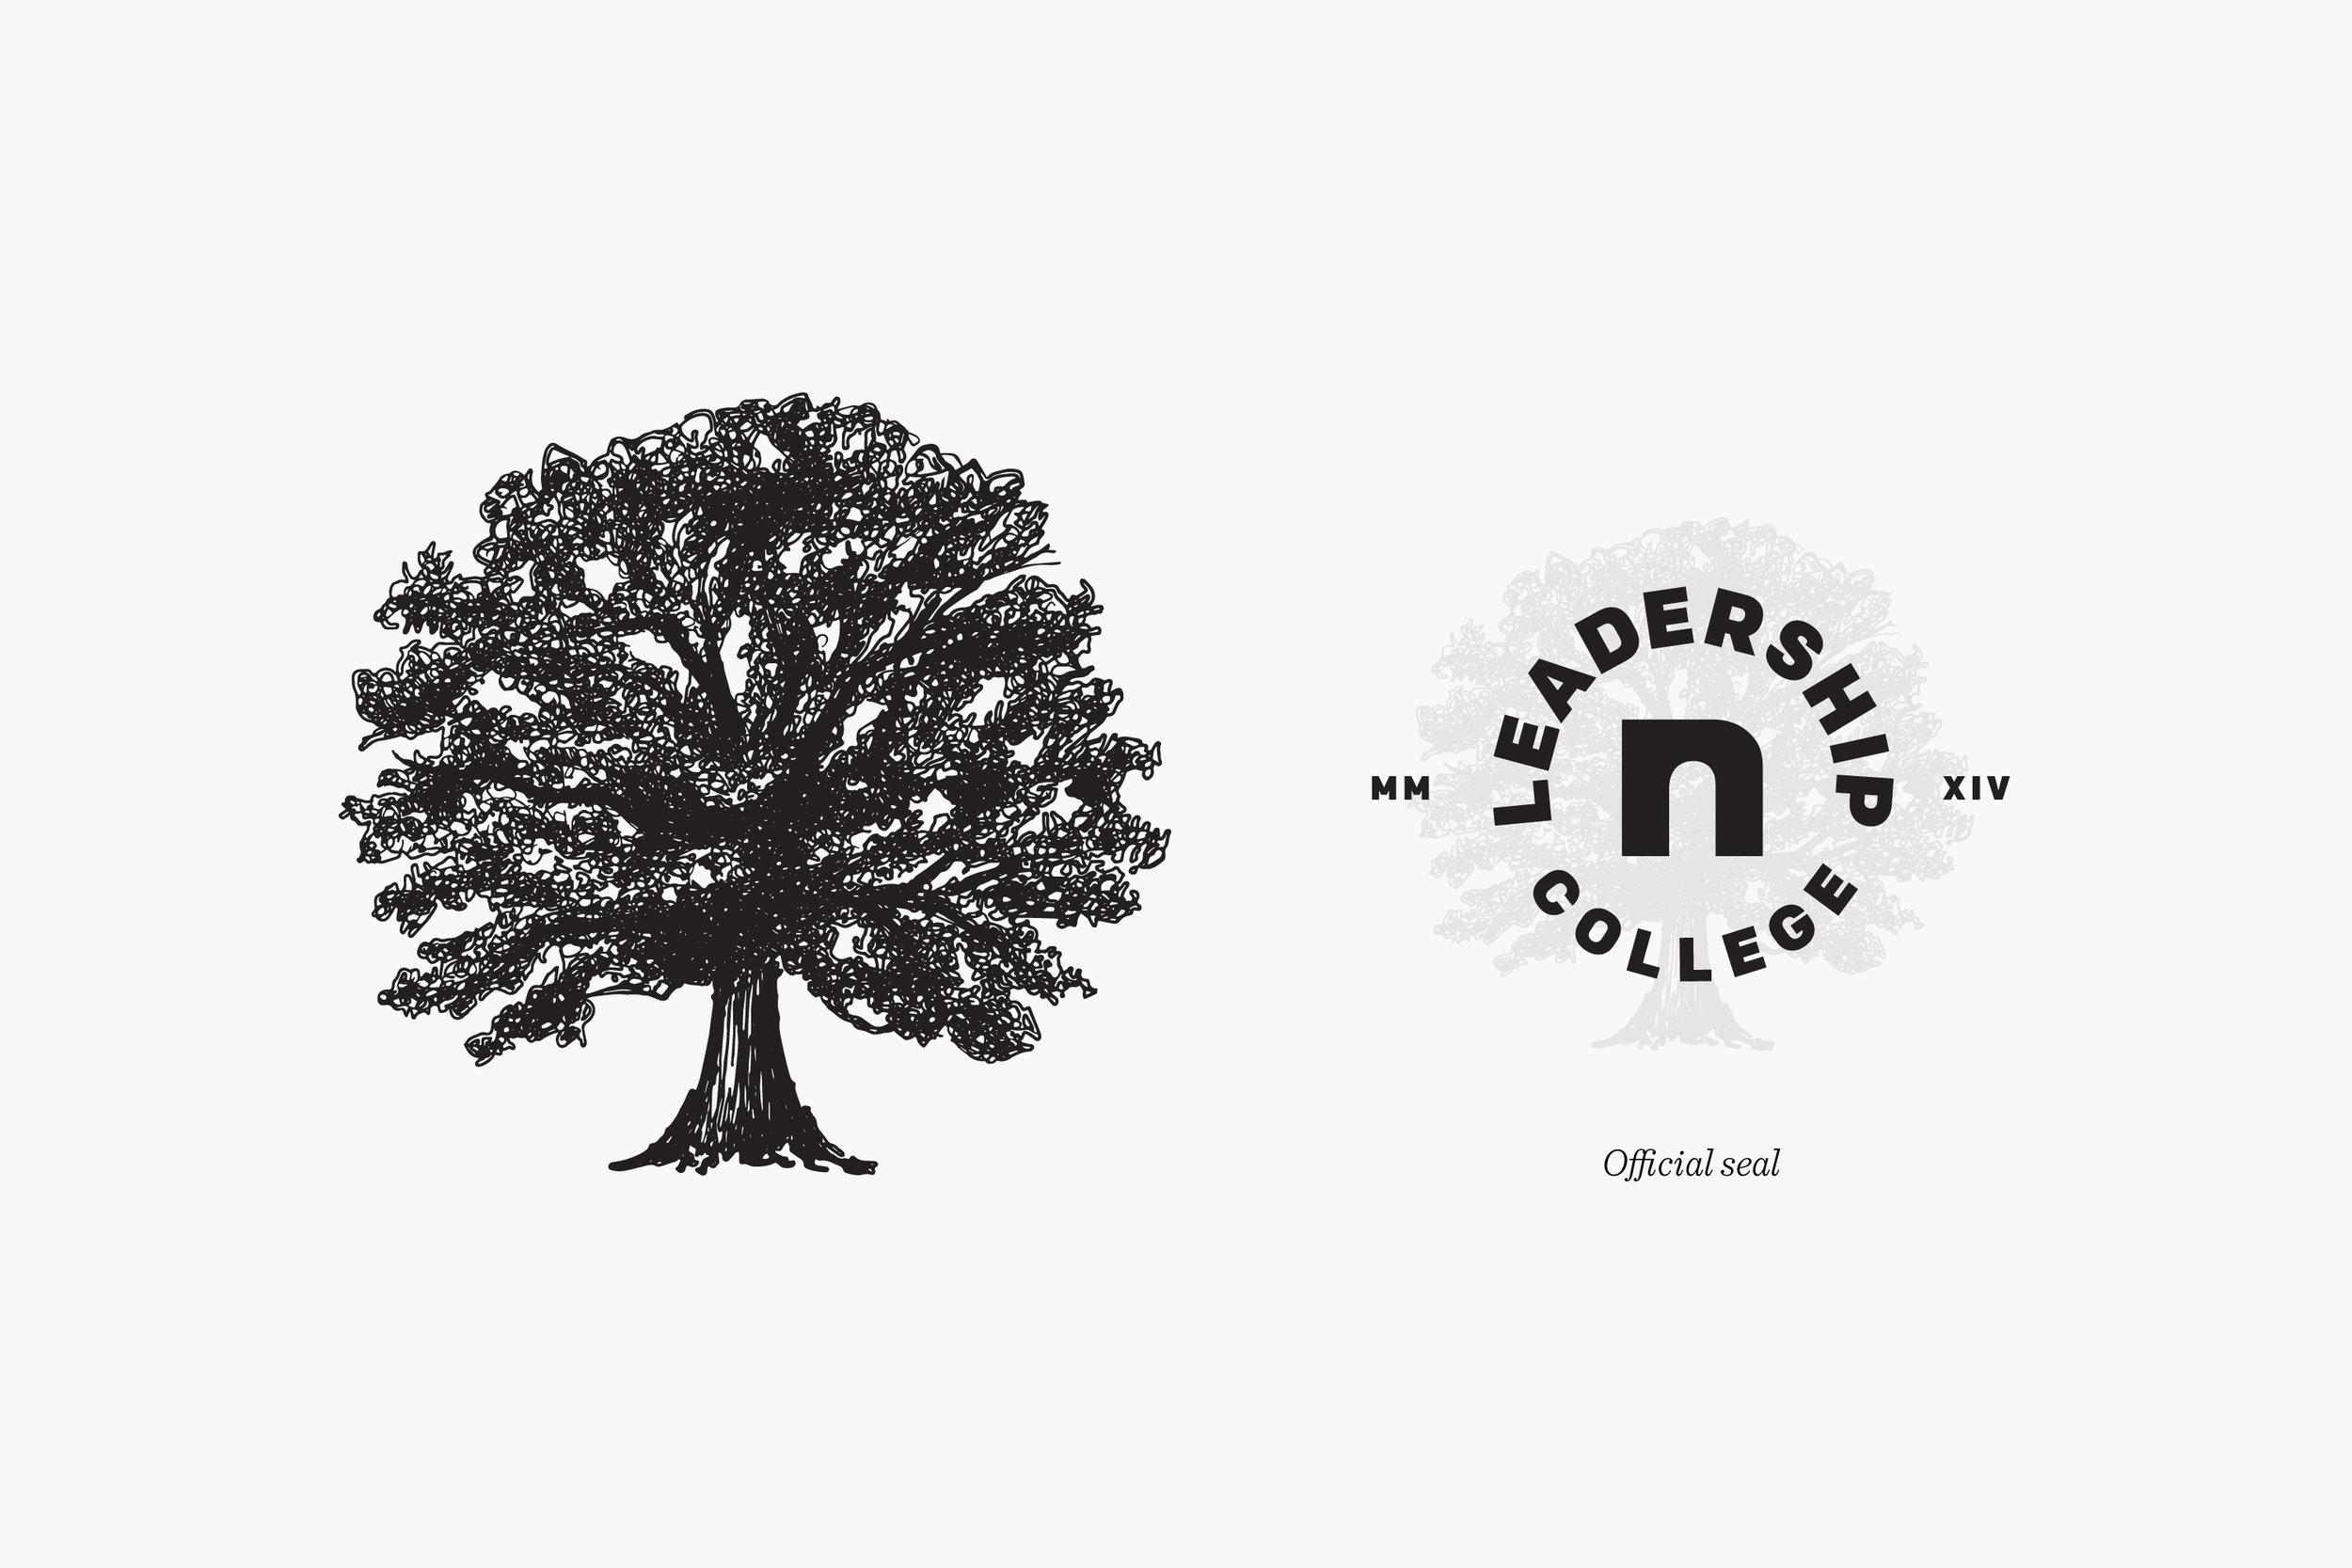 tree and seal@2x-100.jpg